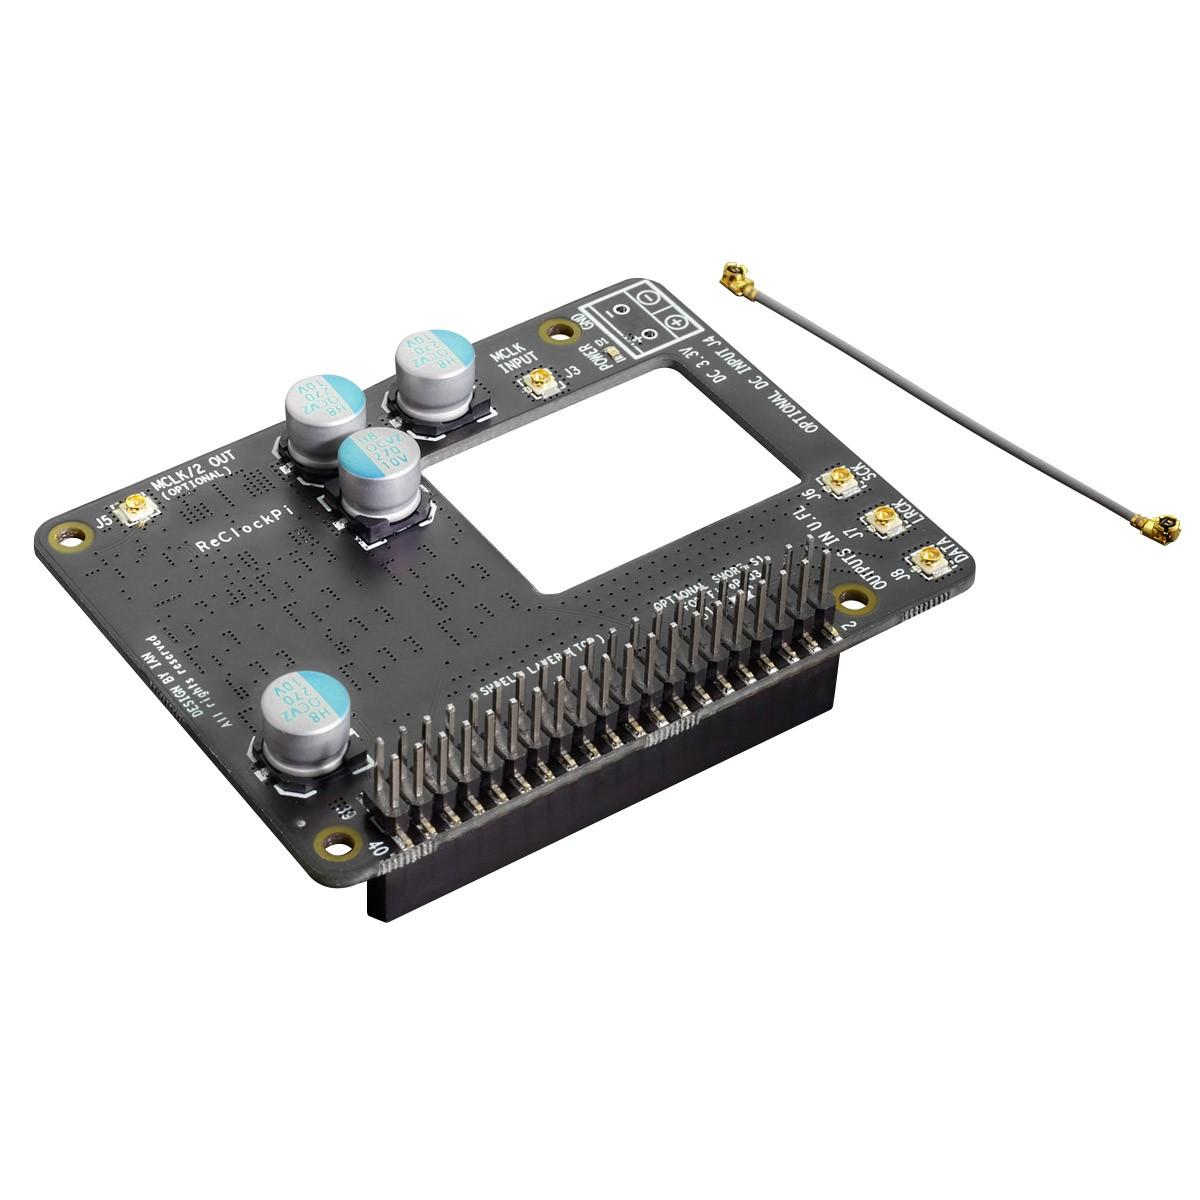 IAN CANADA RECLOCKPI Double Reclocker Faible Bruit / Faible Jitter I2S / DSD